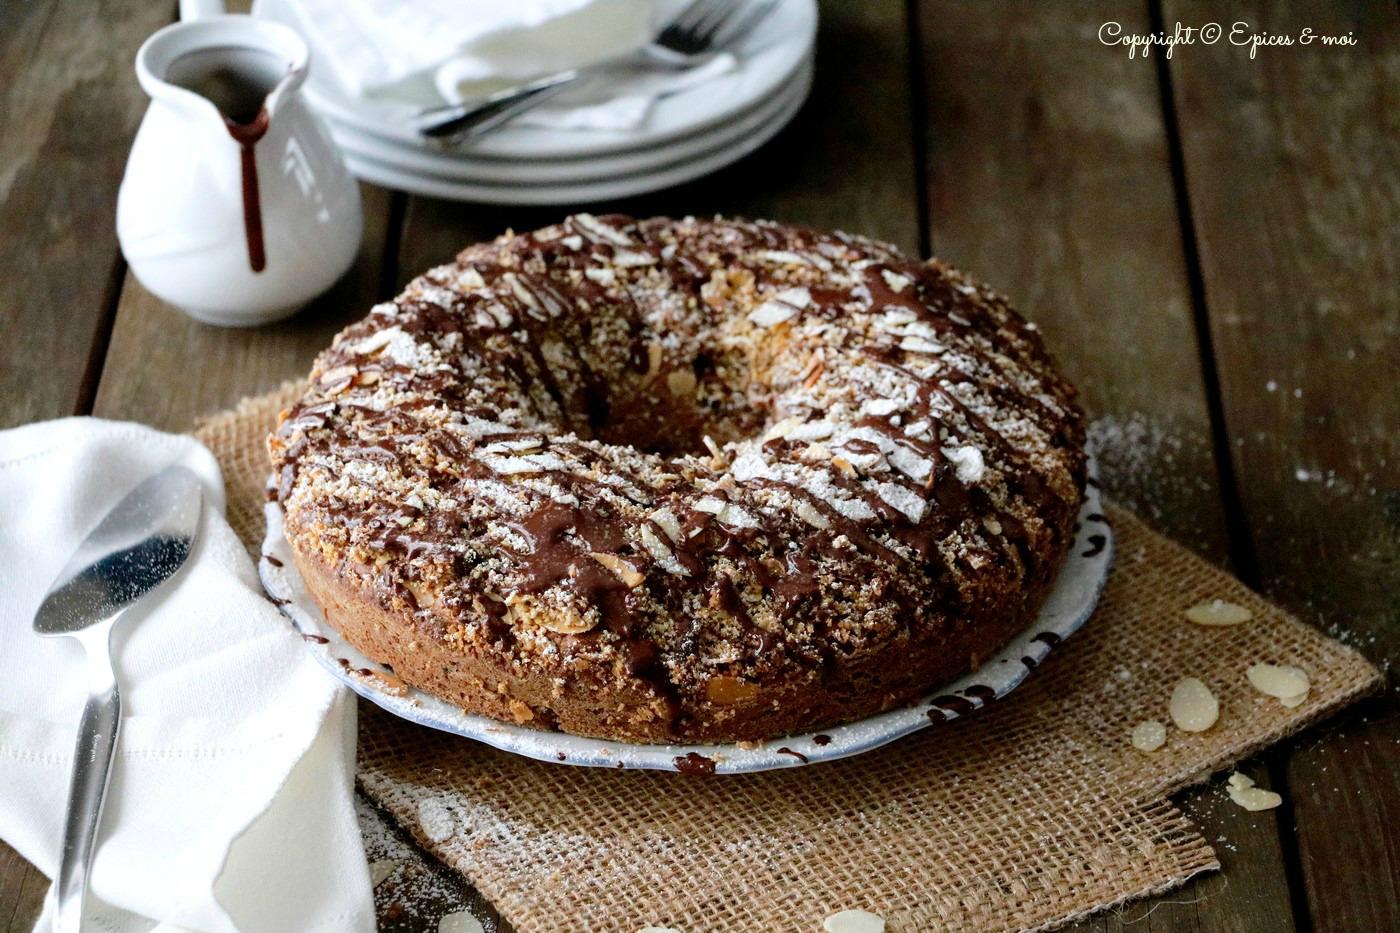 Epices & moi Gâteau choco amandes 1